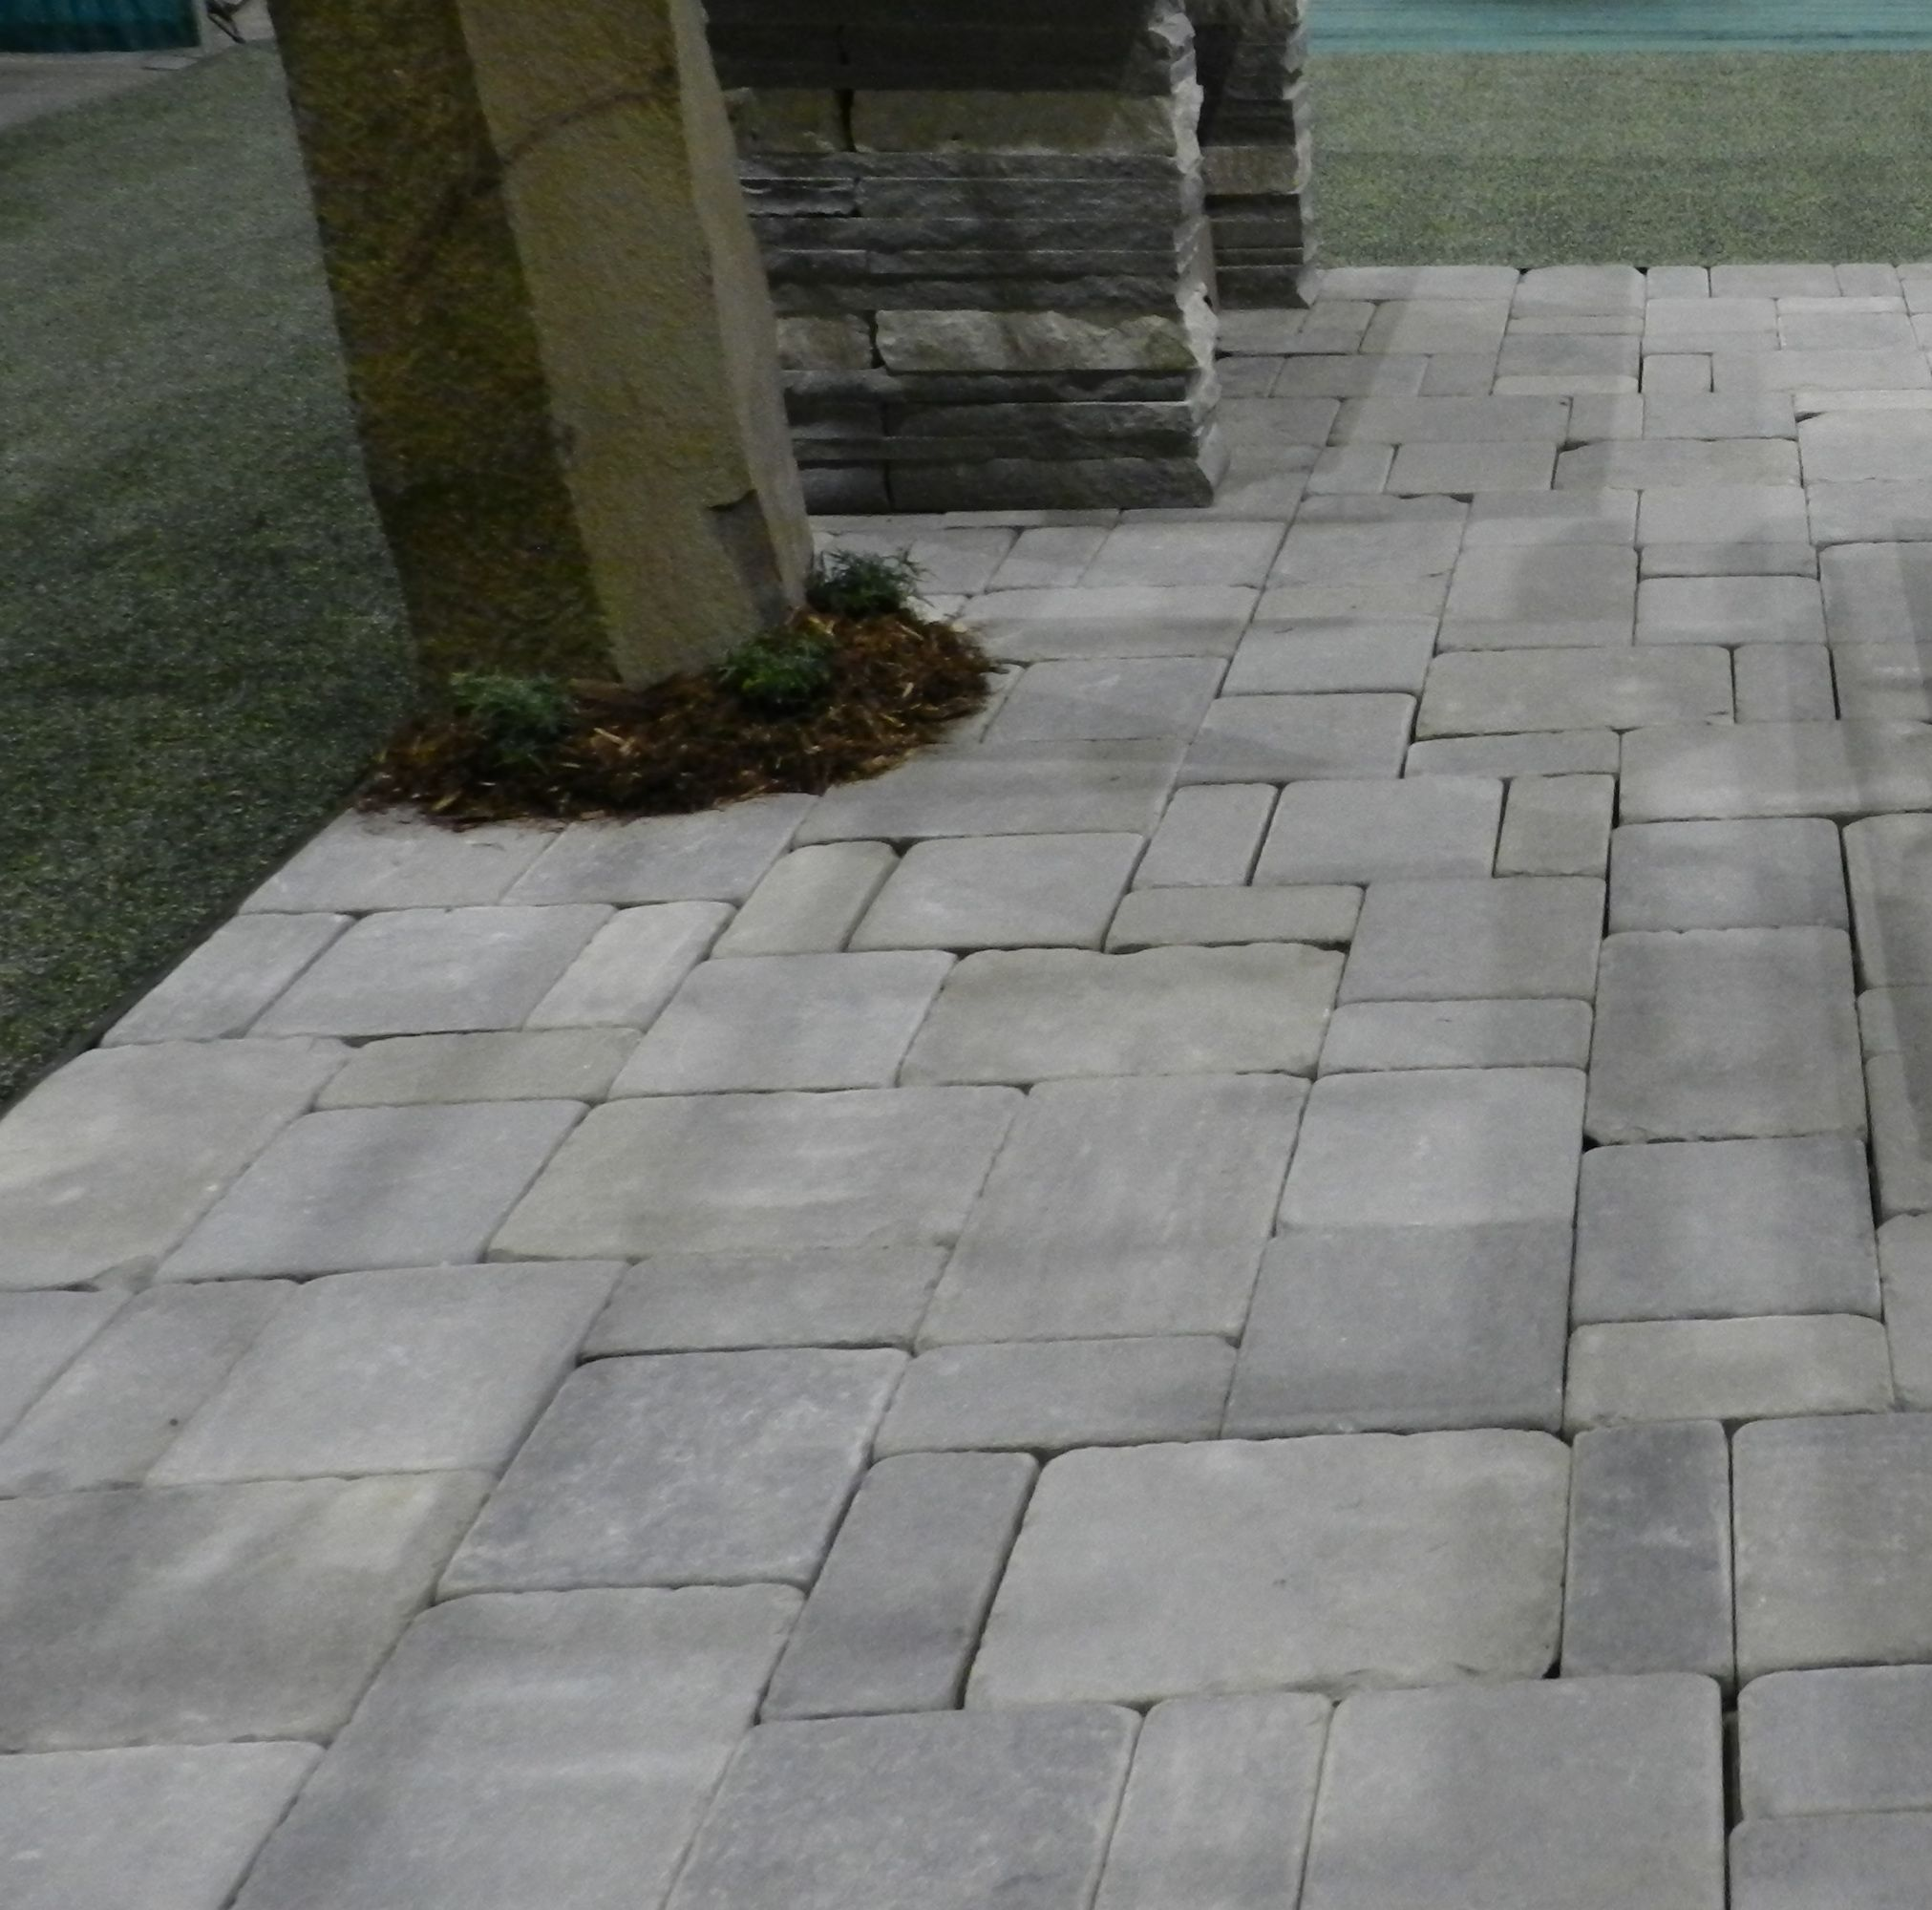 Patio Blocks And Stones : Nice bluestone patio design ideas